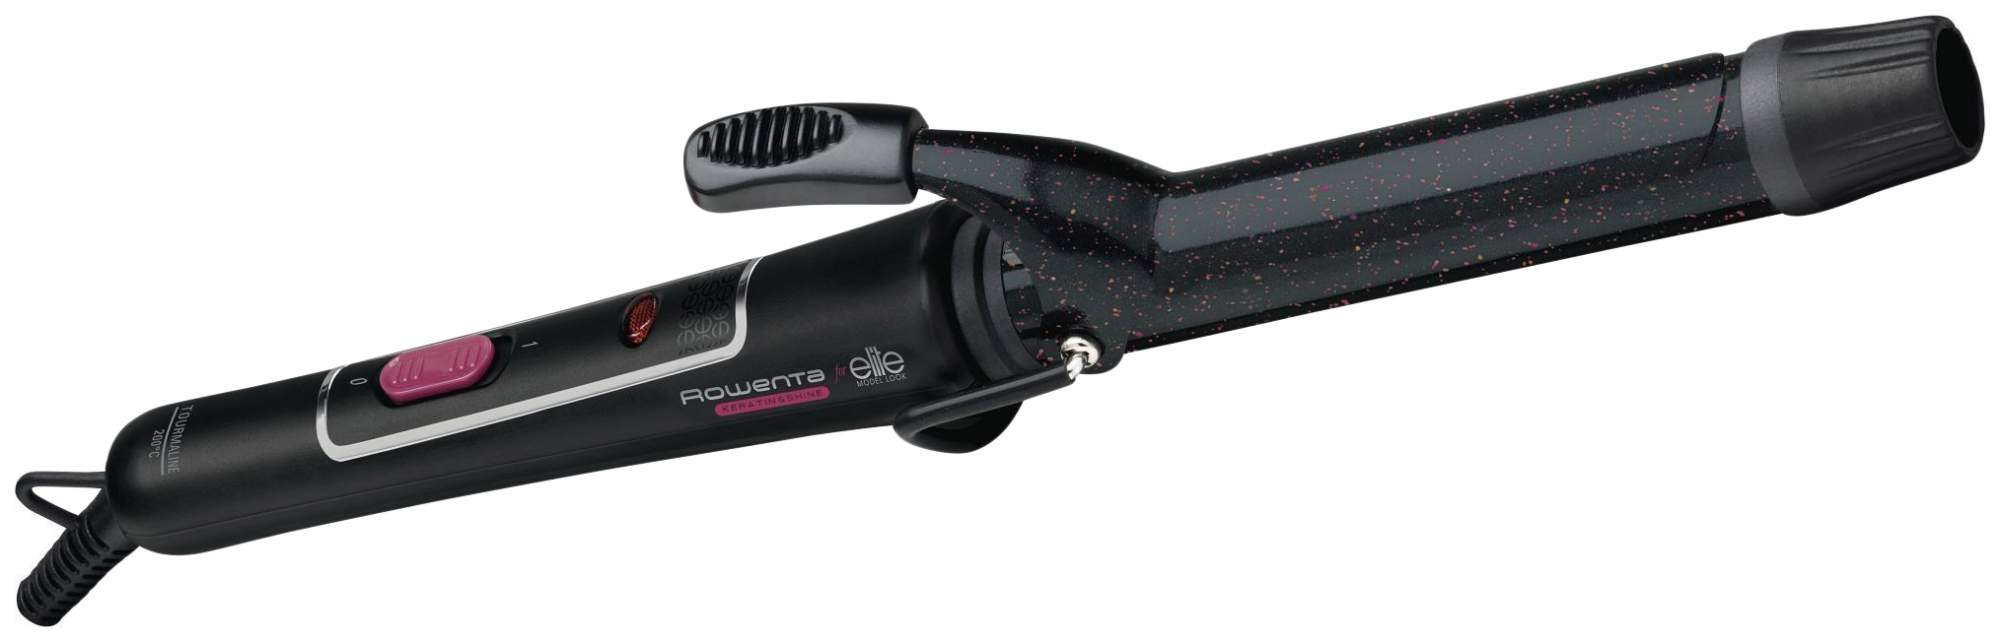 Прибор для укладки волос ROWENTA